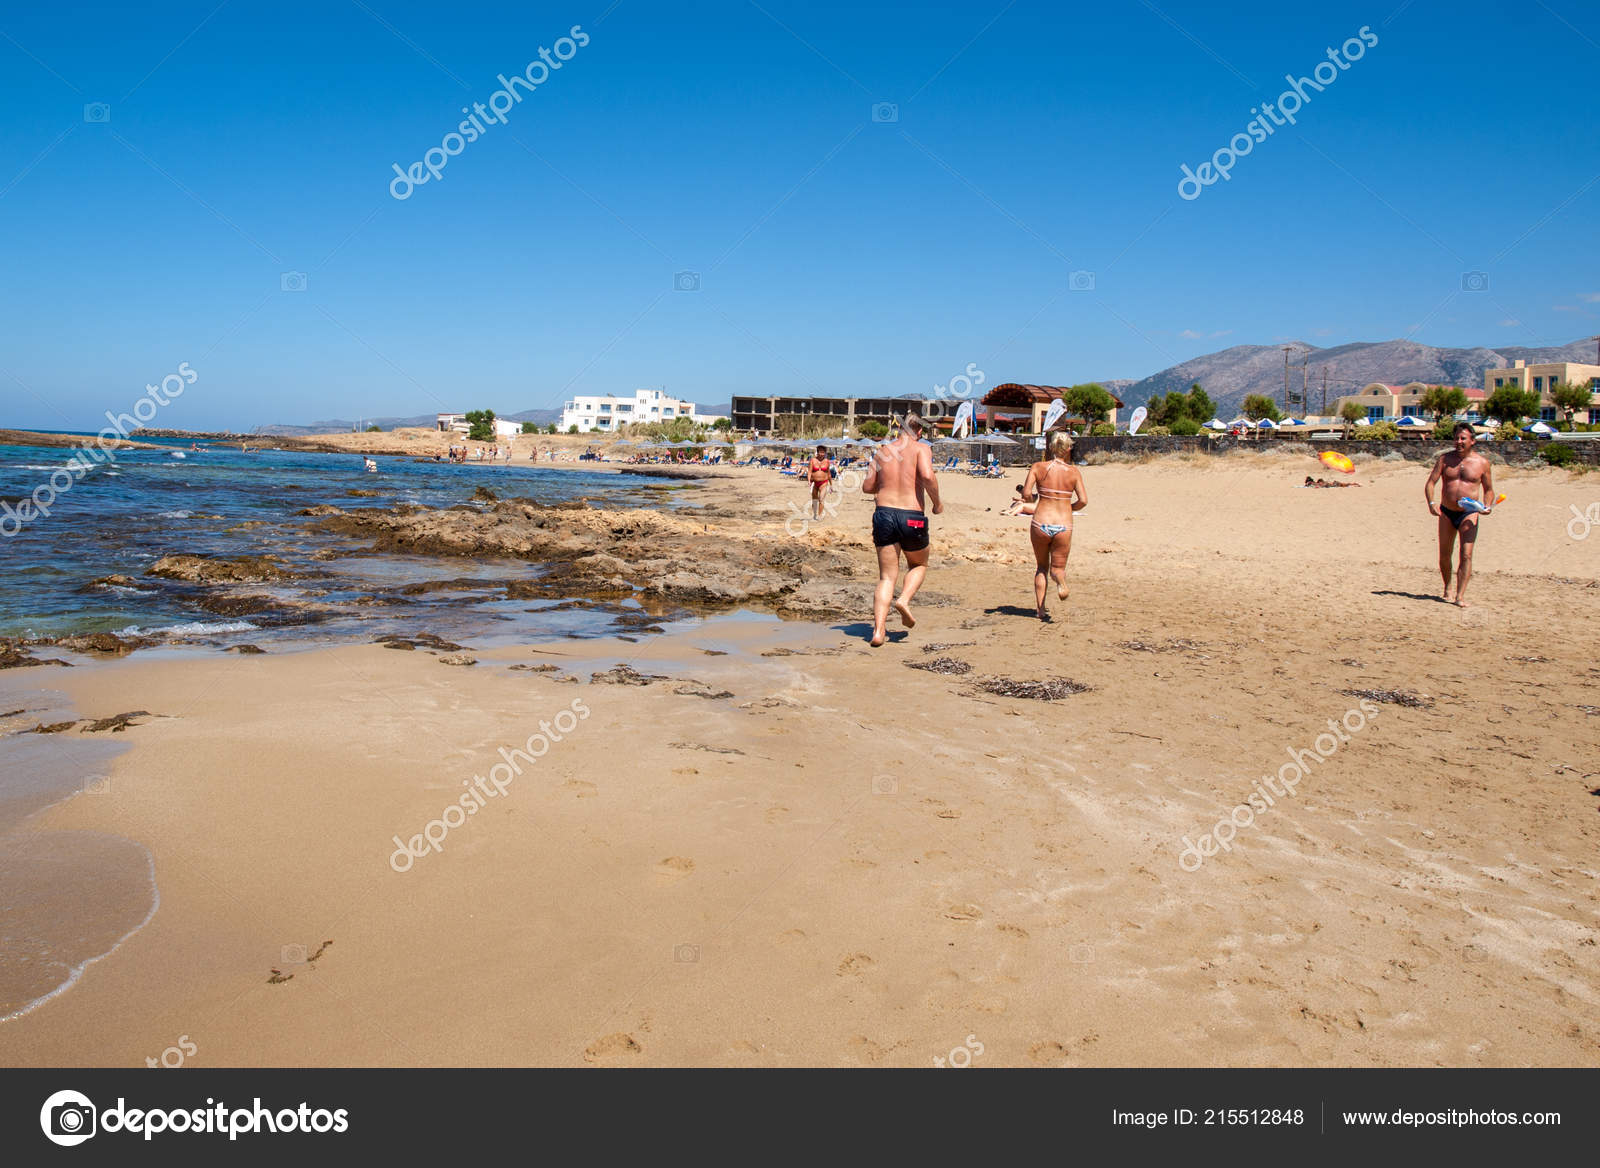 Malia Crete Greece July 2018 People Resting Sunny Day Beach